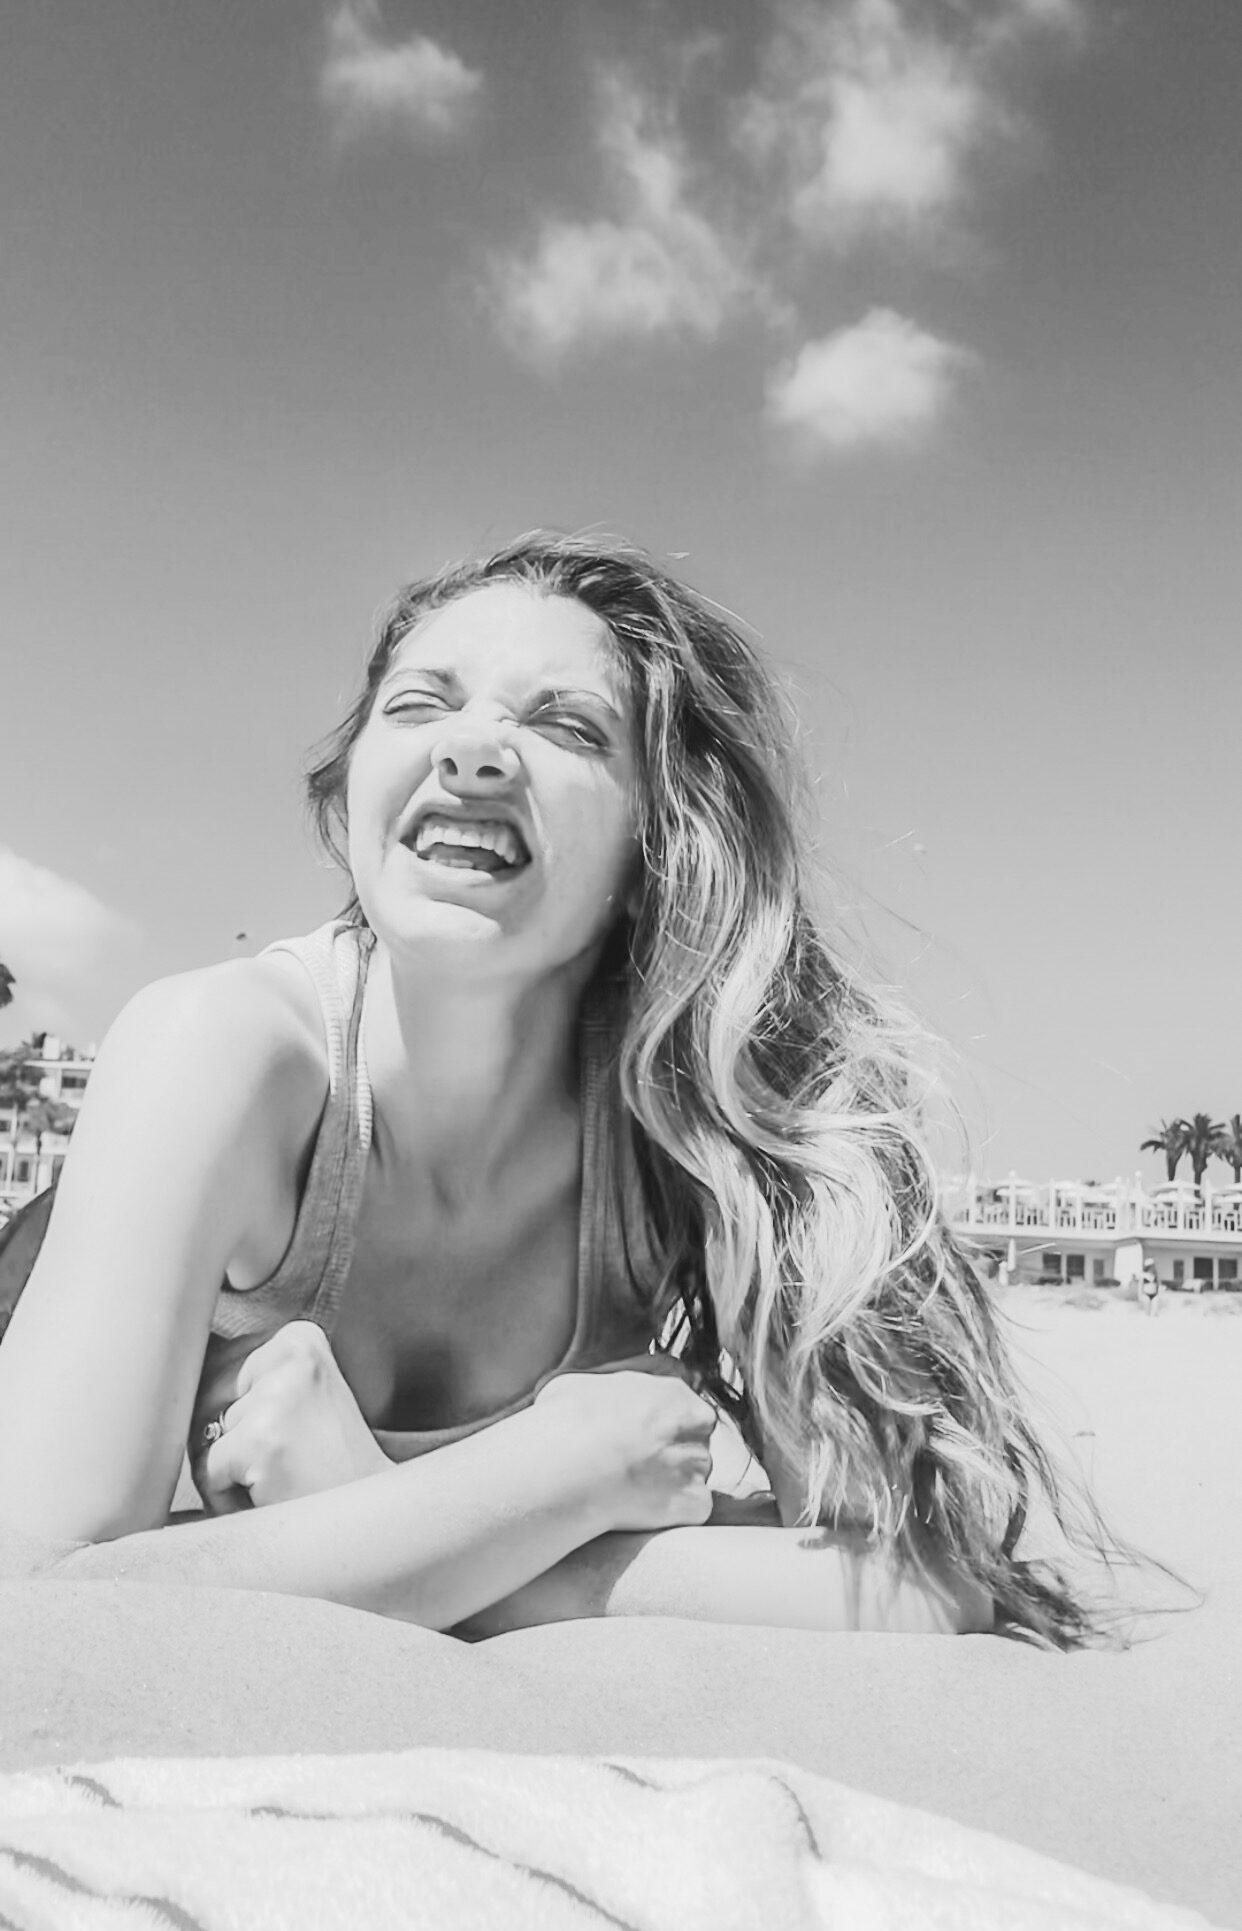 Kathy beach coronado